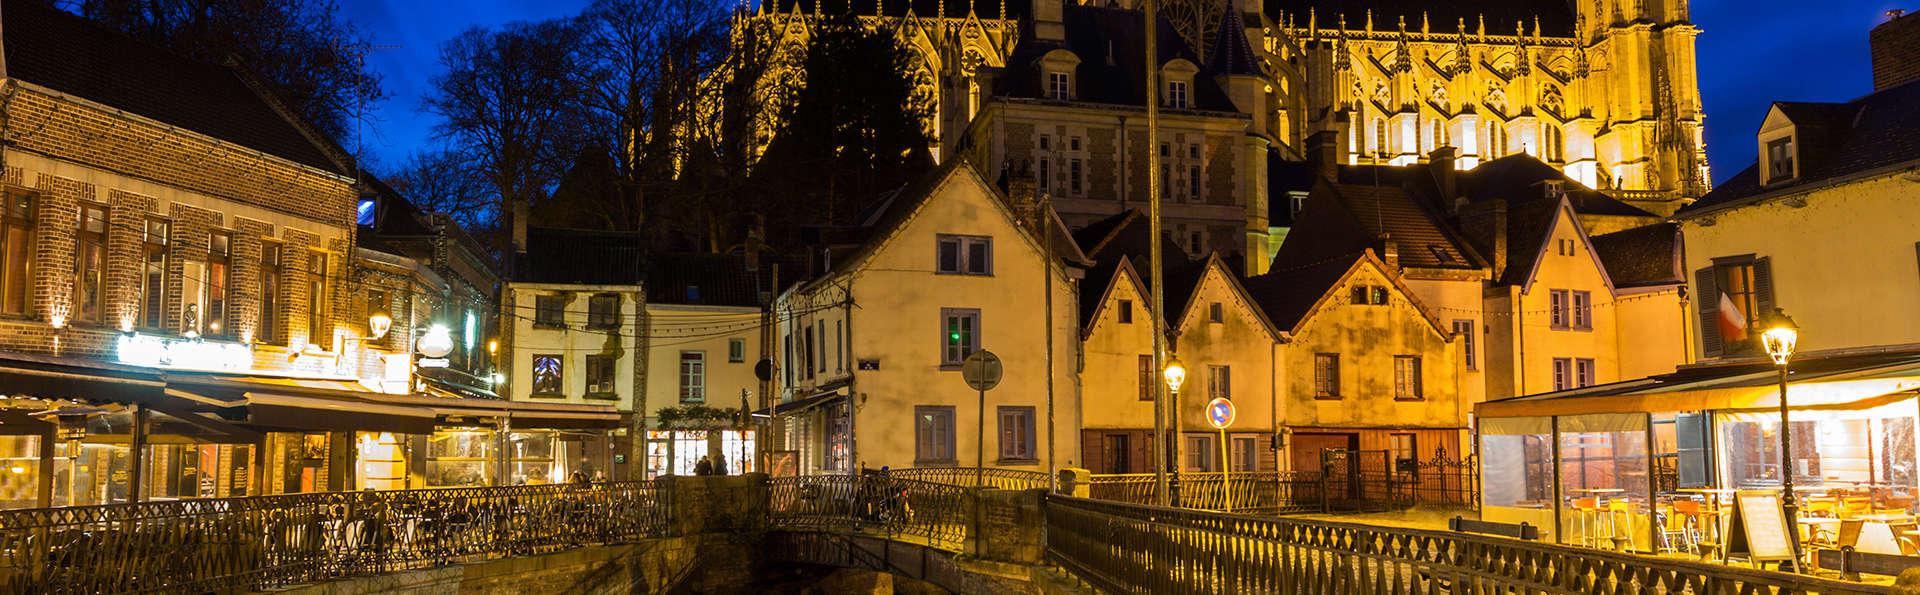 Novotel Amiens Pole Jules Verne - EDIT_destination1.jpg